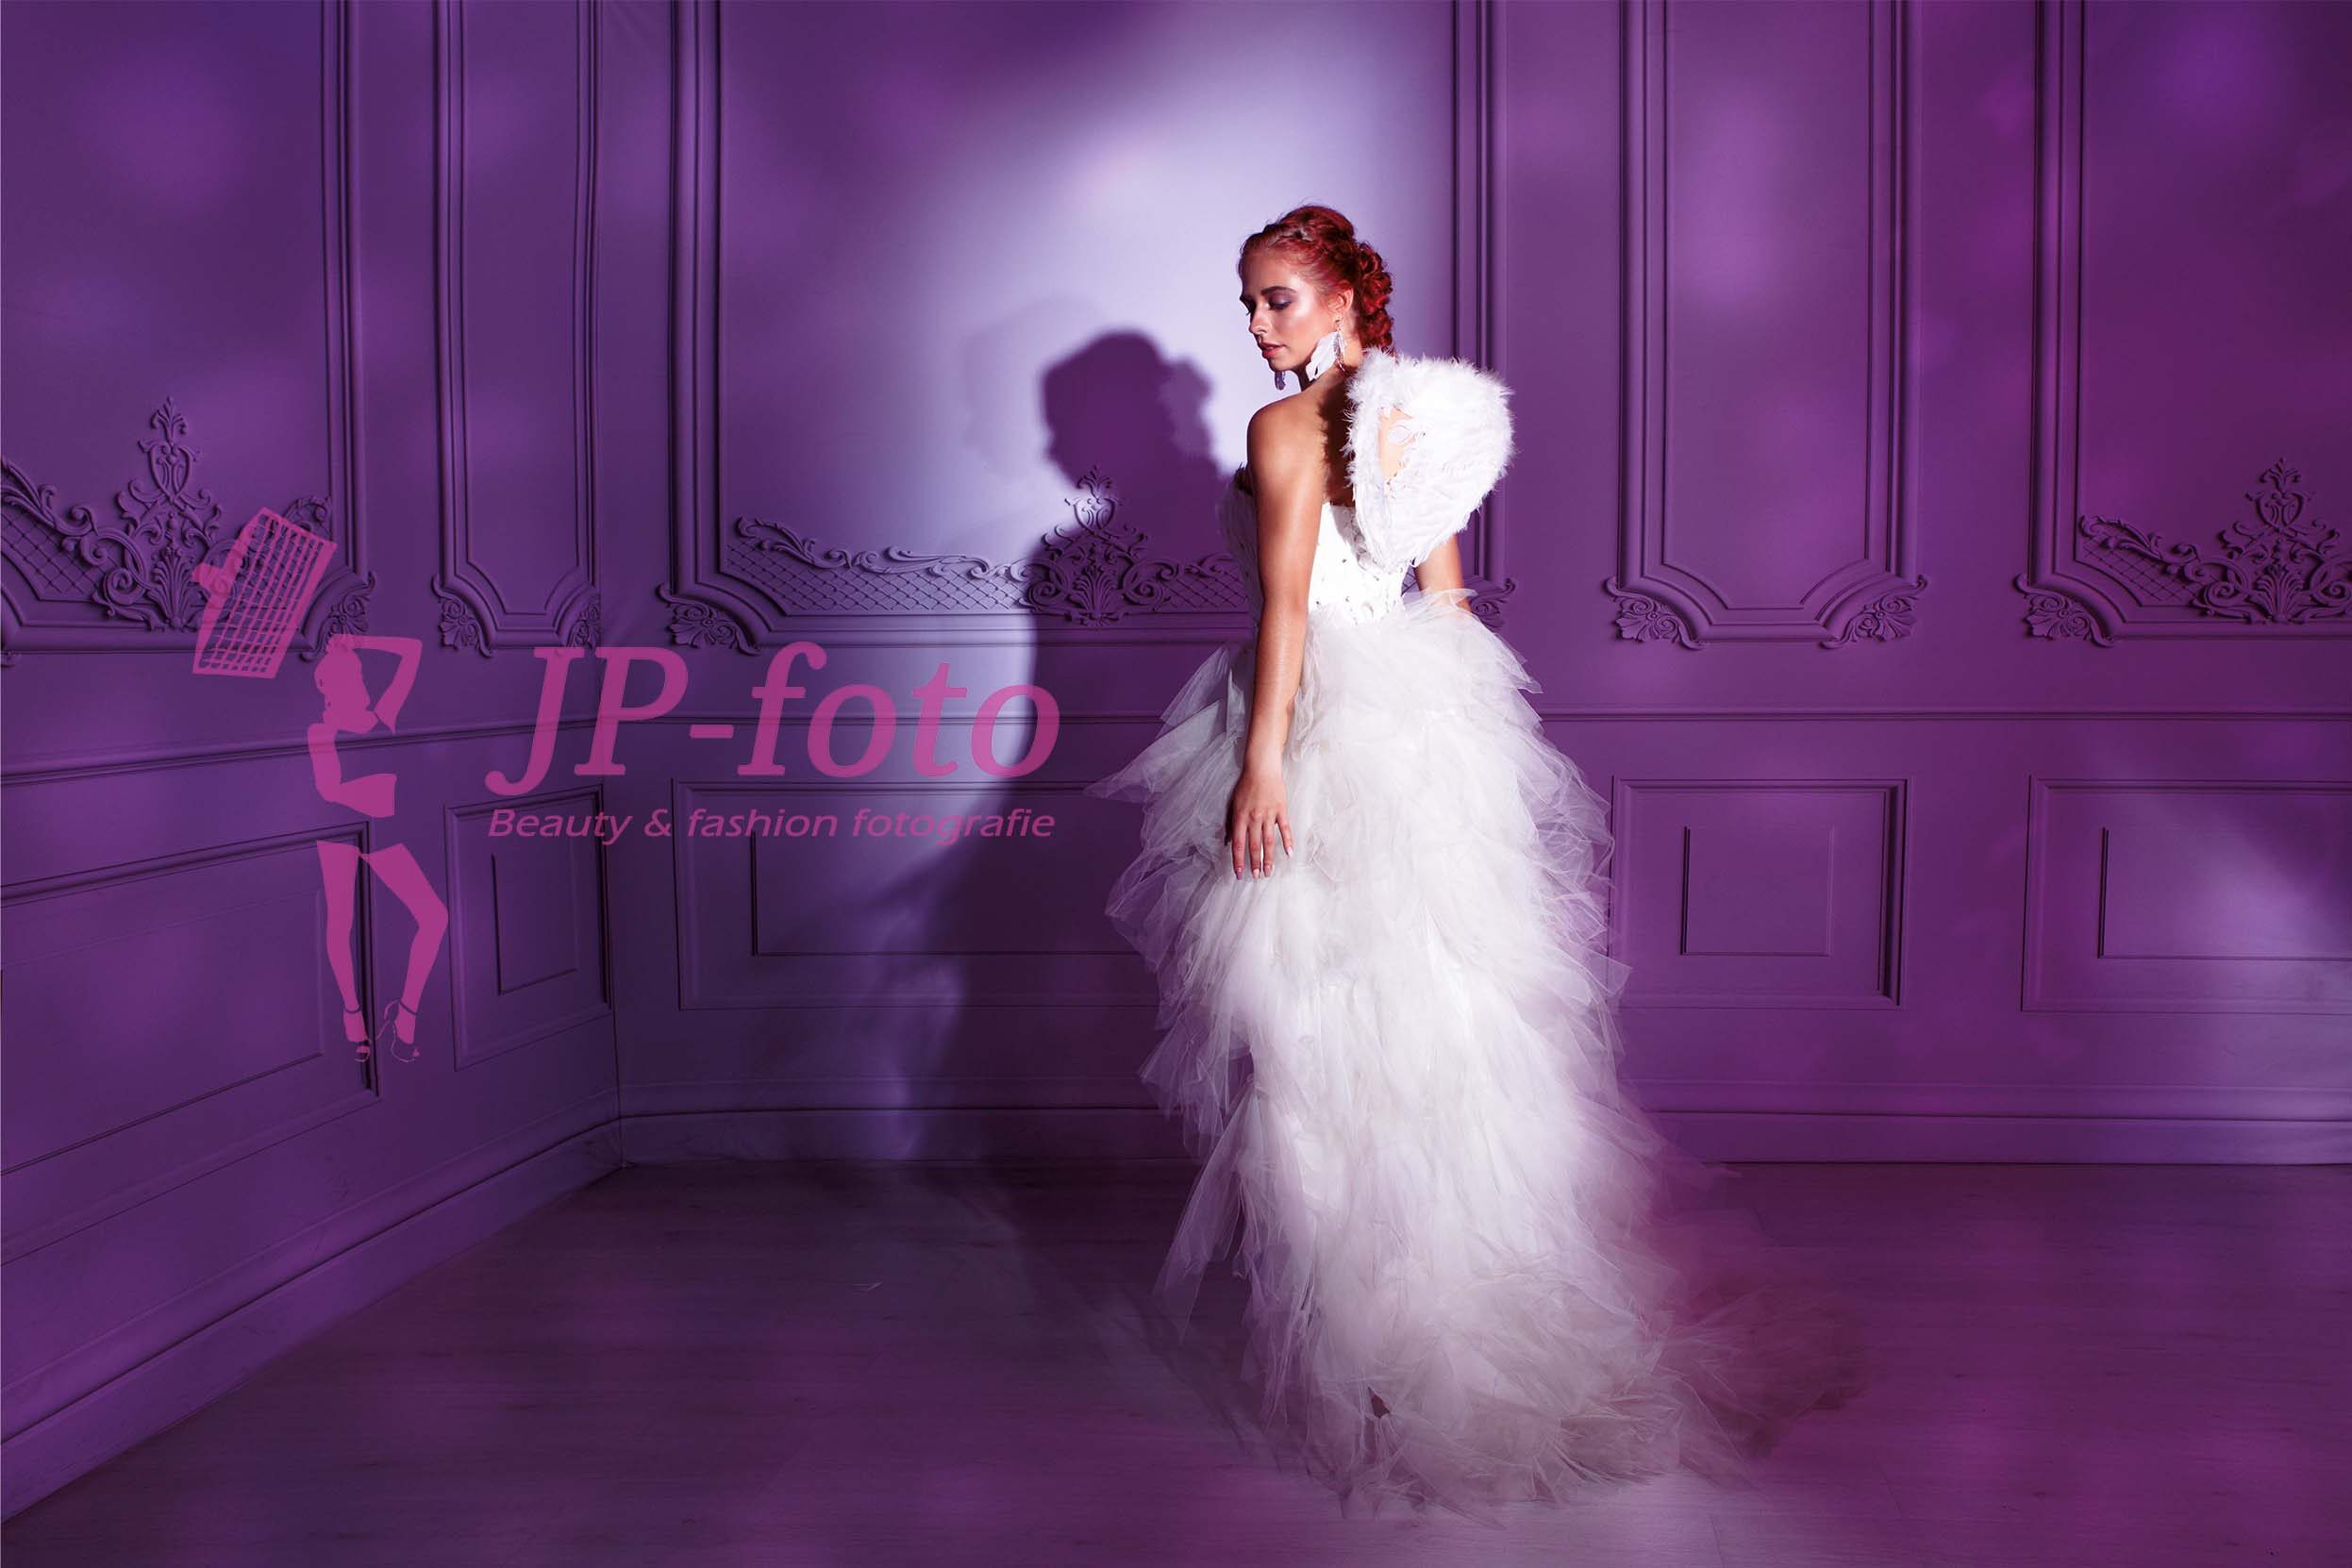 Beauty & Fashion fotografie